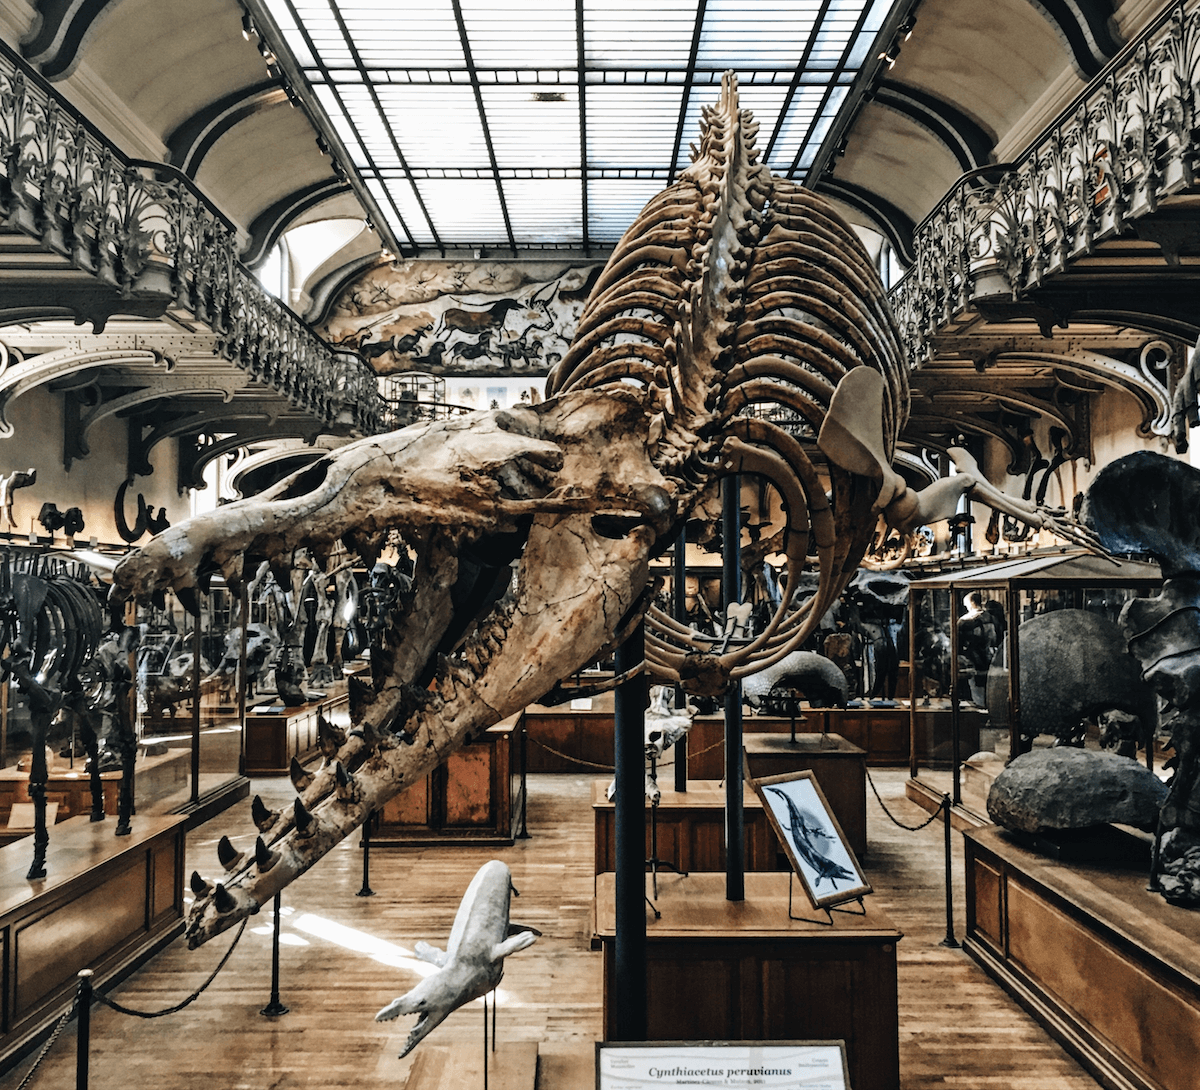 dinosaur_bones_anthony_delanoix.jpg.png